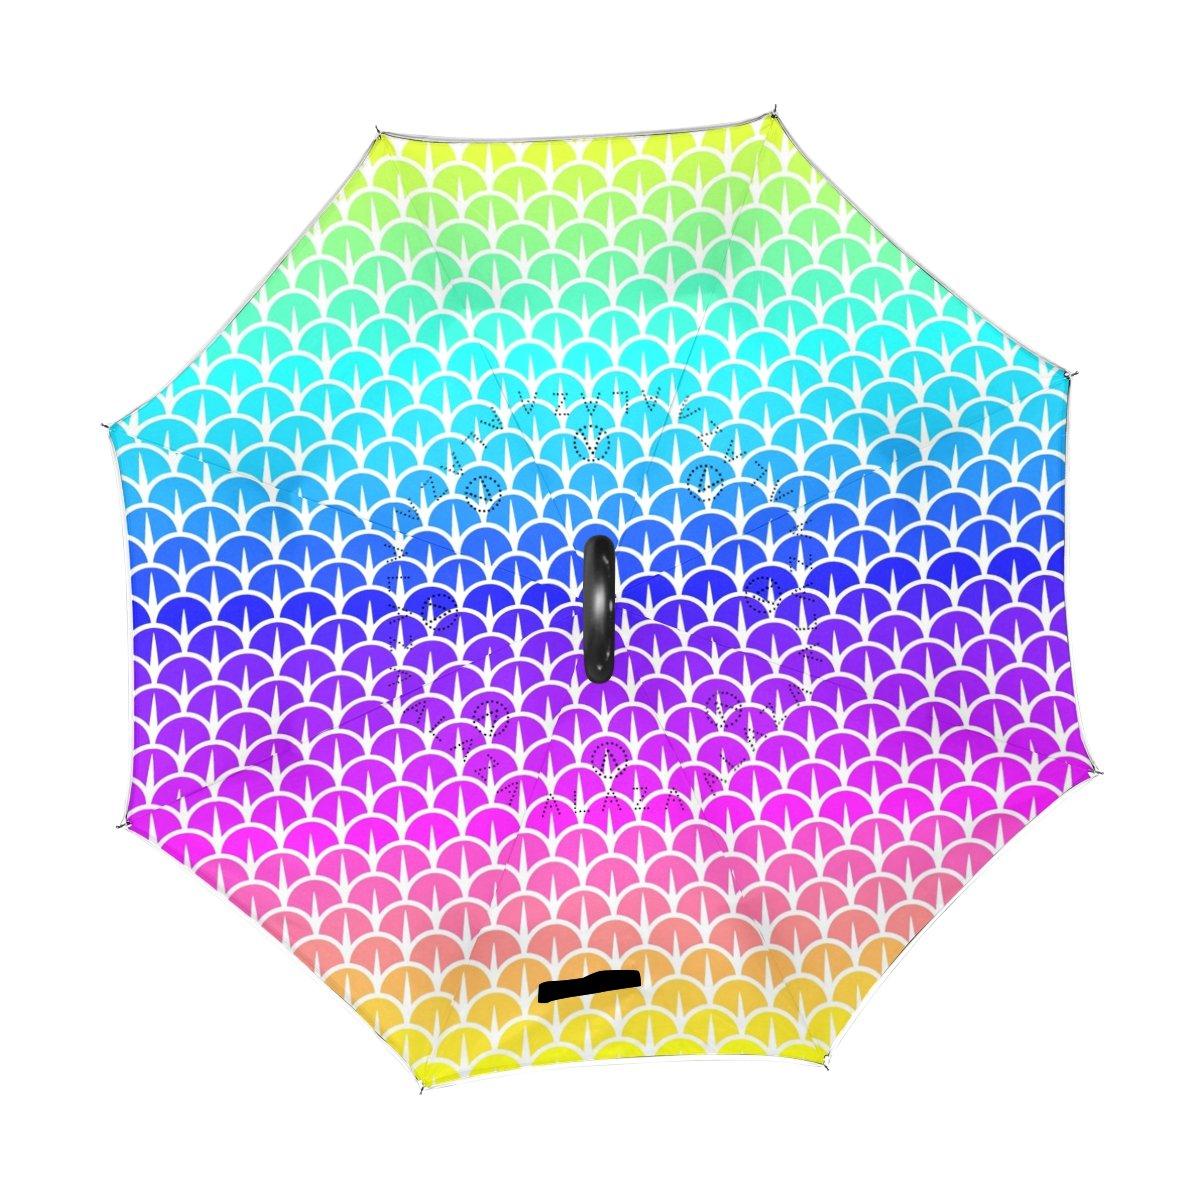 ISAOA Paraguas Grande invertido Paraguas Resistente al Viento Doble Capa reversa Plegable Paraguas para Coche Lluvia Uso al Aire Libre Mango en Forma de C Auto pie b/ásculas Arco Iris Paraguas